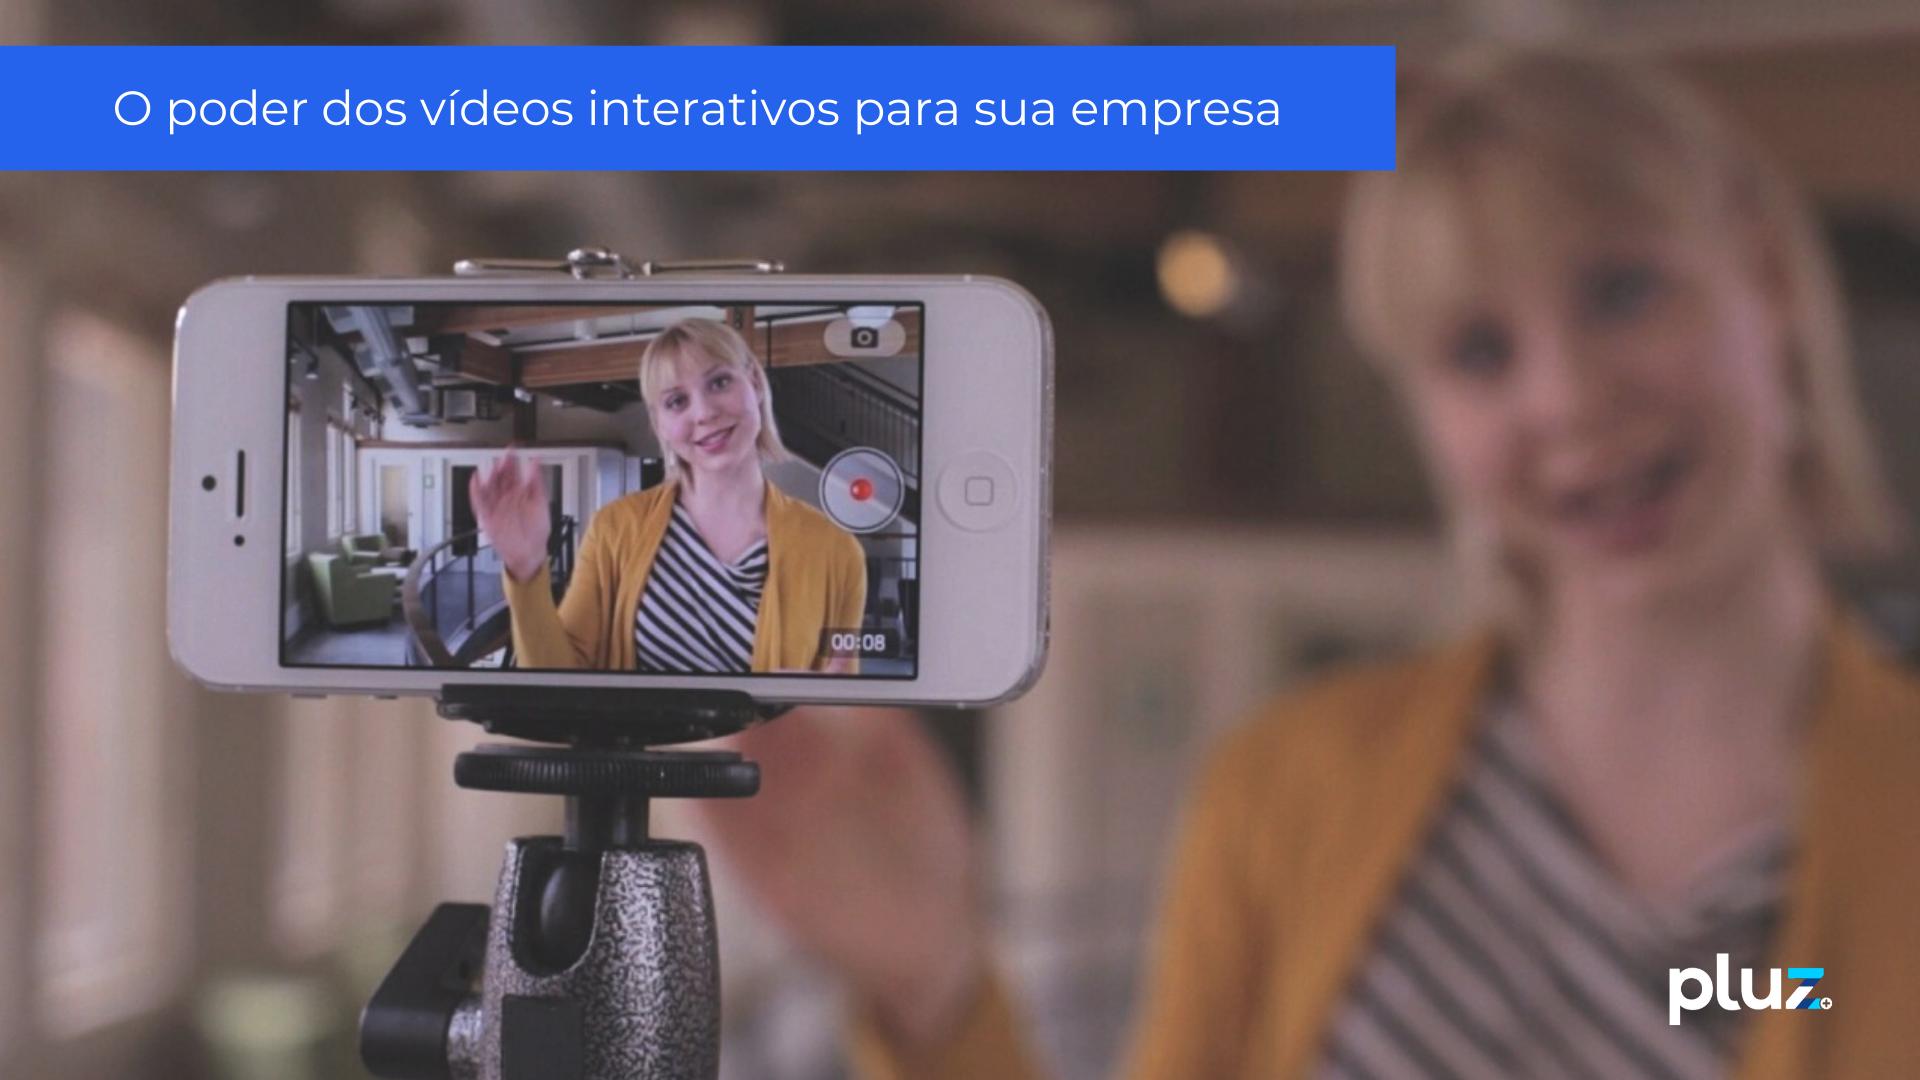 O poder dos videos interativos para sua empresa